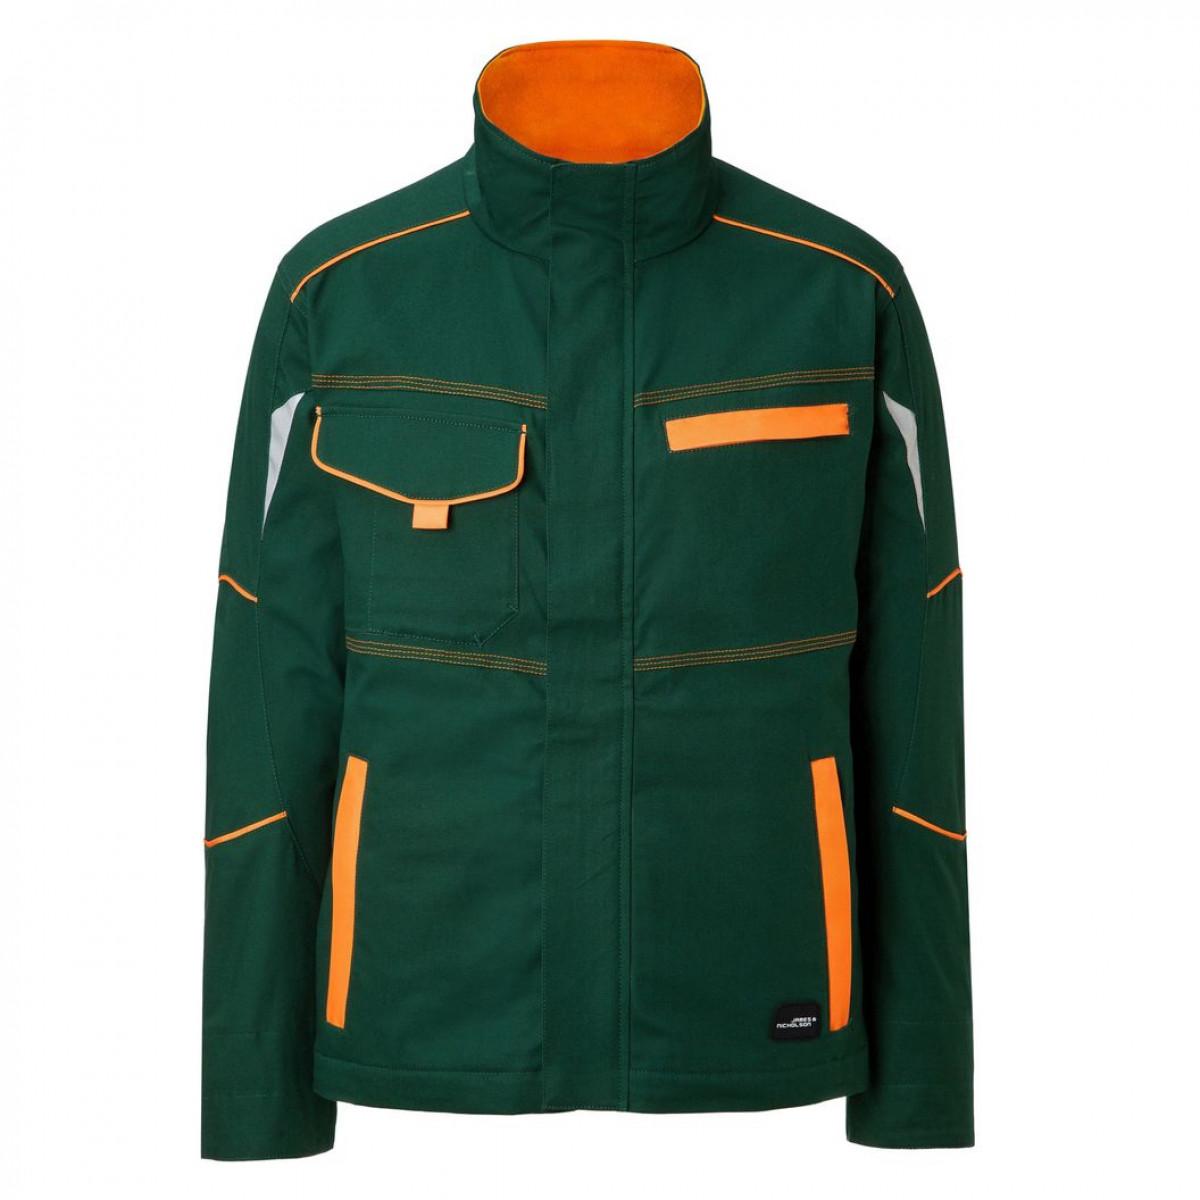 Куртка мужская JN849 Workwear Jacket - Темно-зеленый/Оранжевый